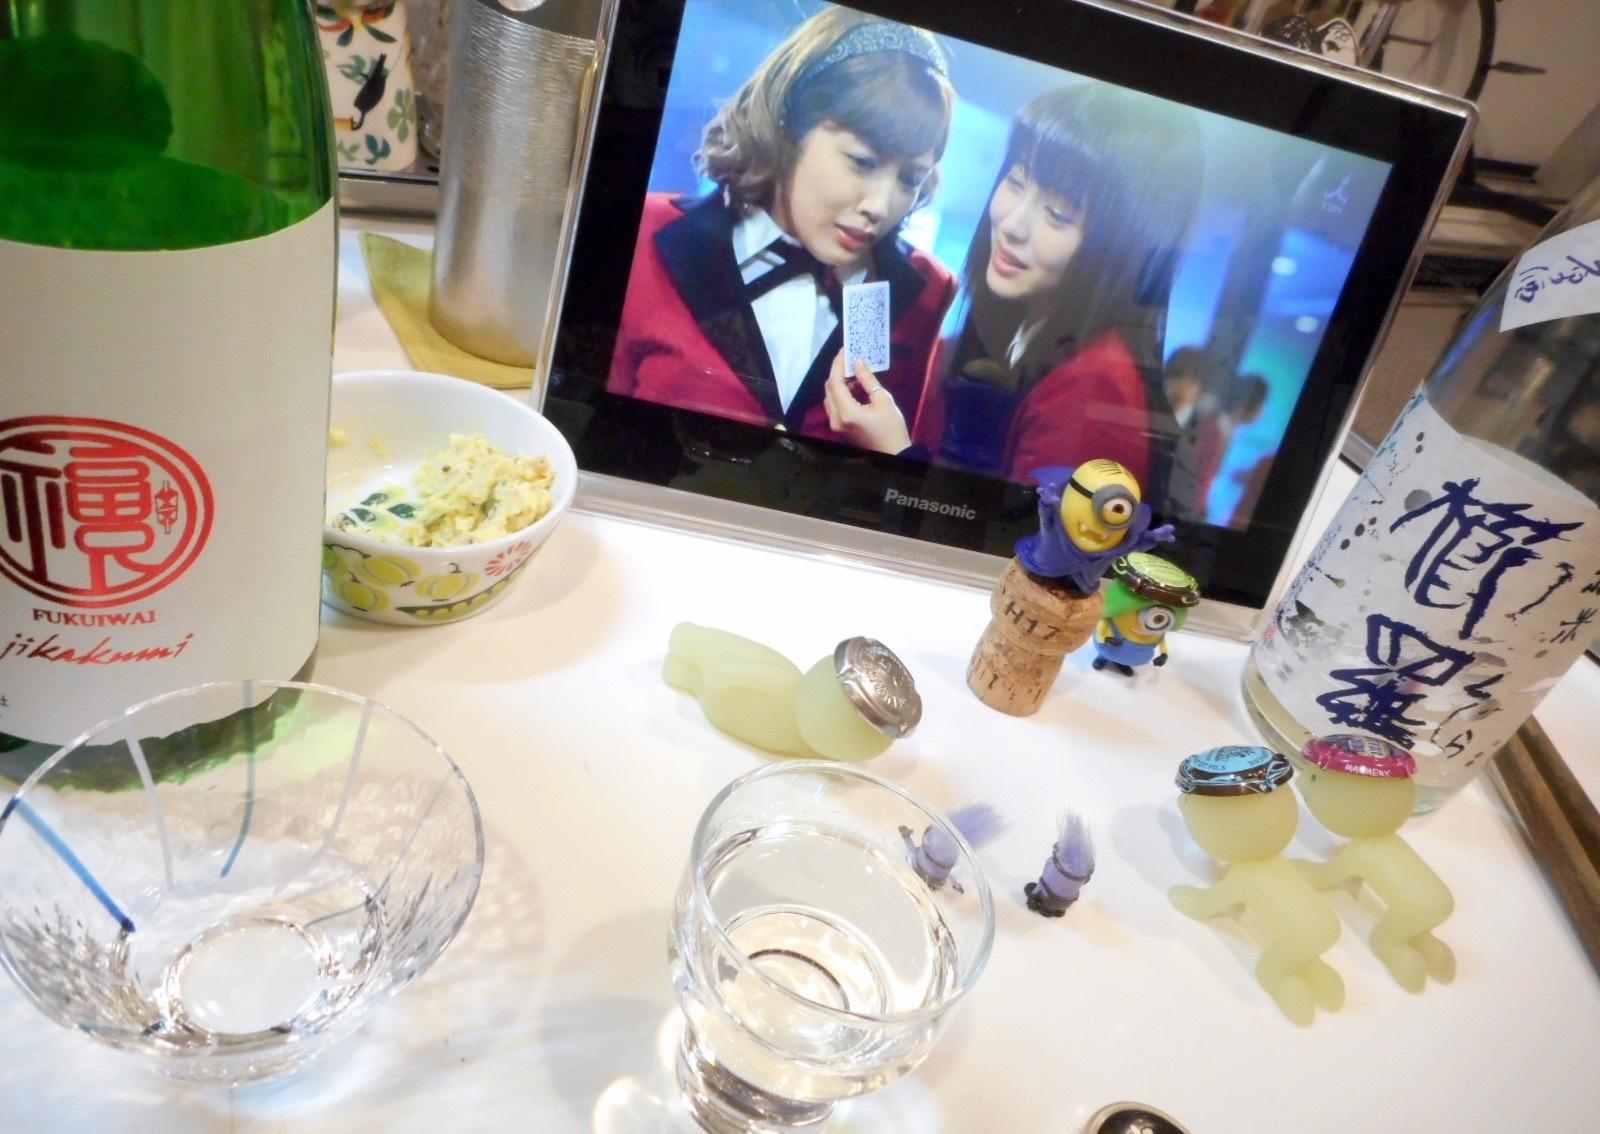 fukuiwai_yamada50jikagumi29by12.jpg